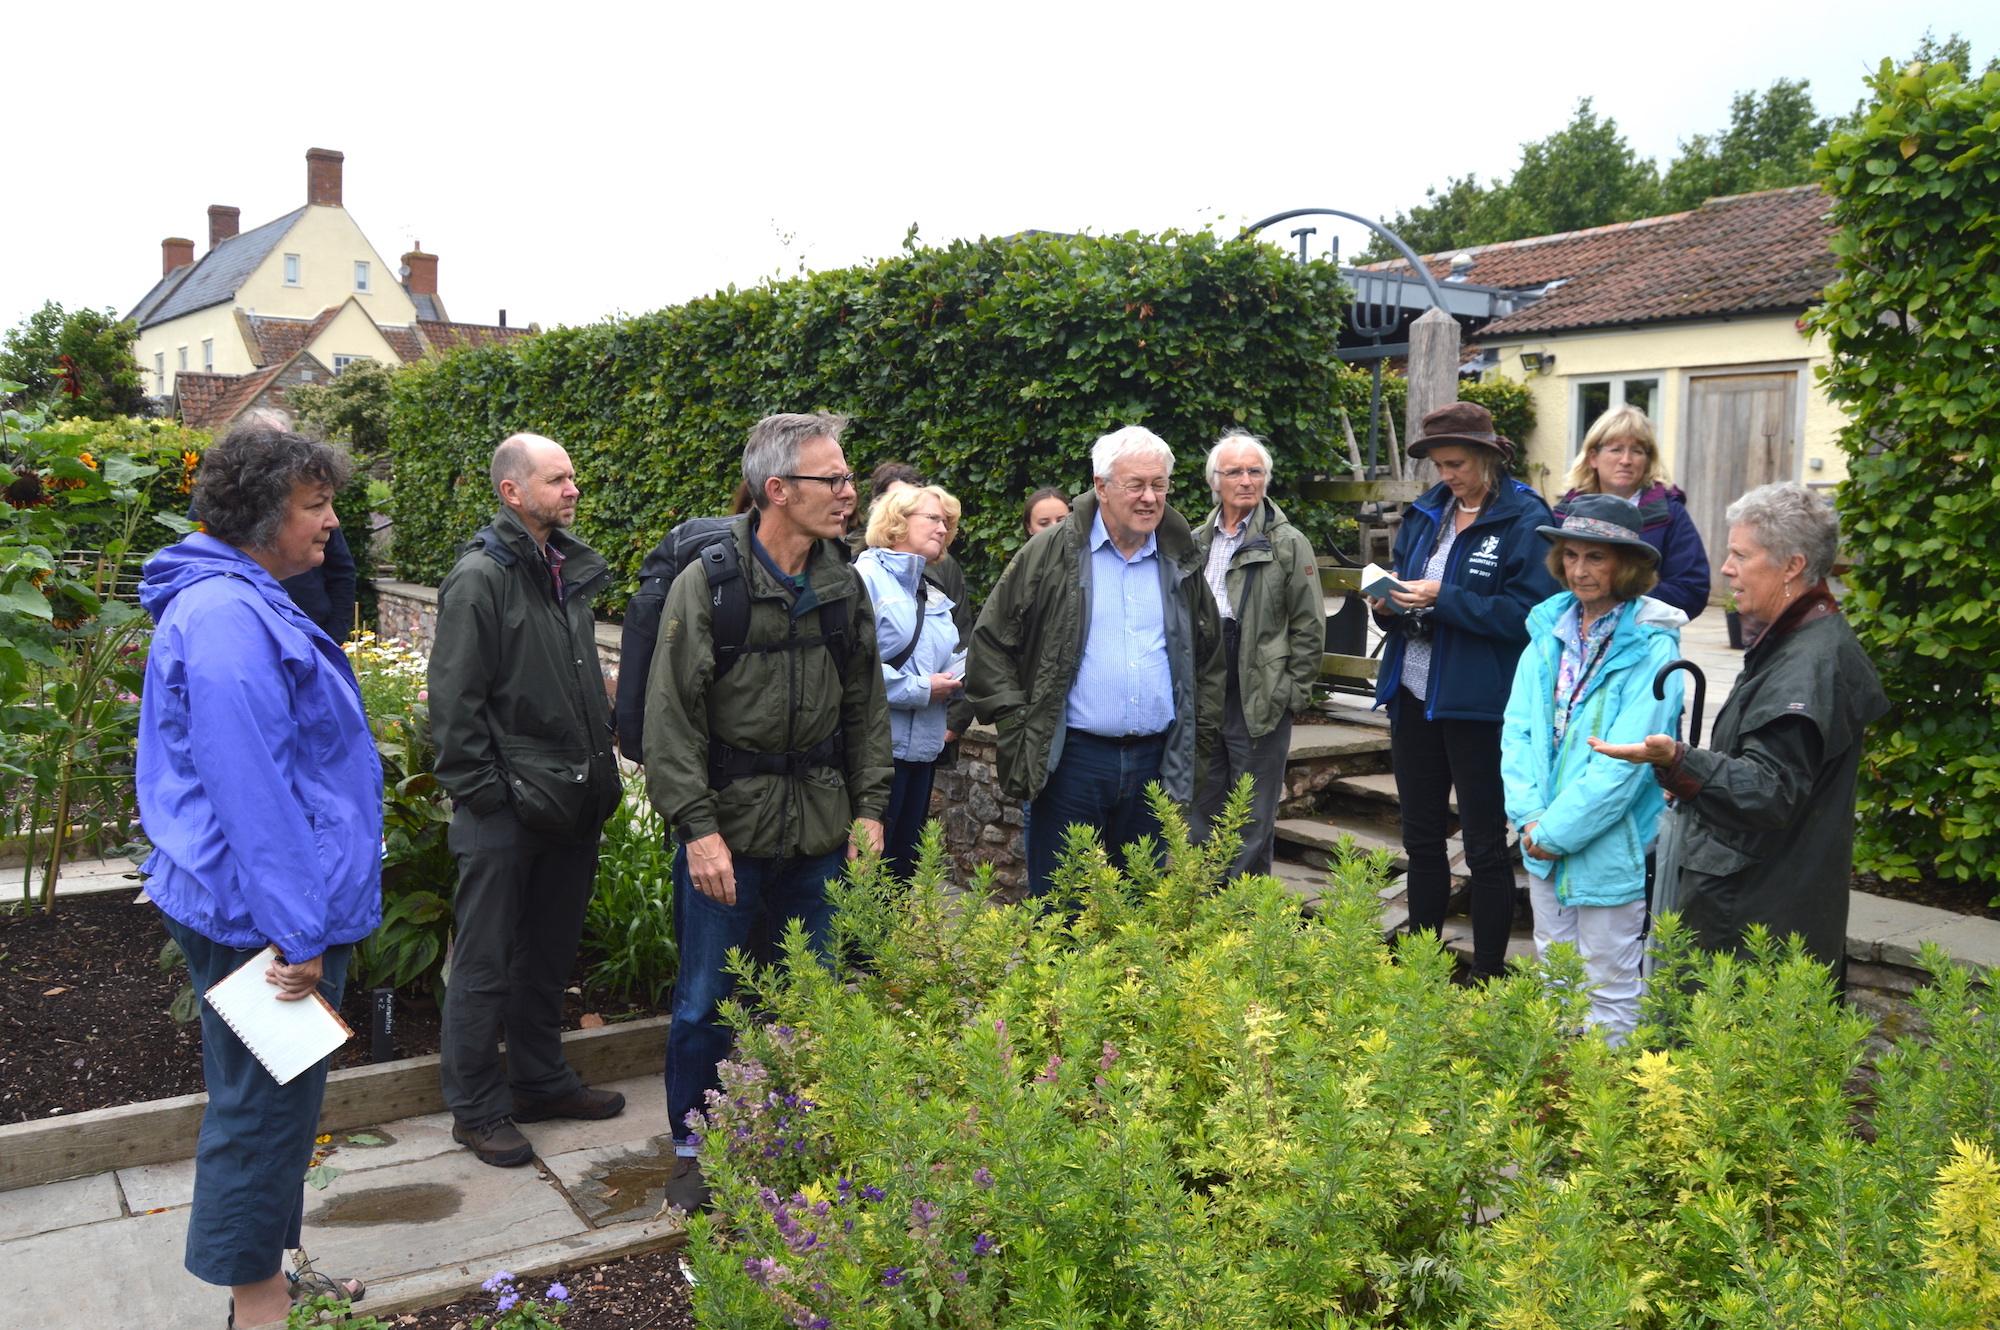 - Leading garden photographer Jason Ingram shares his skills at Yeo Valley Organic Gardens, Somerset, July 2017.